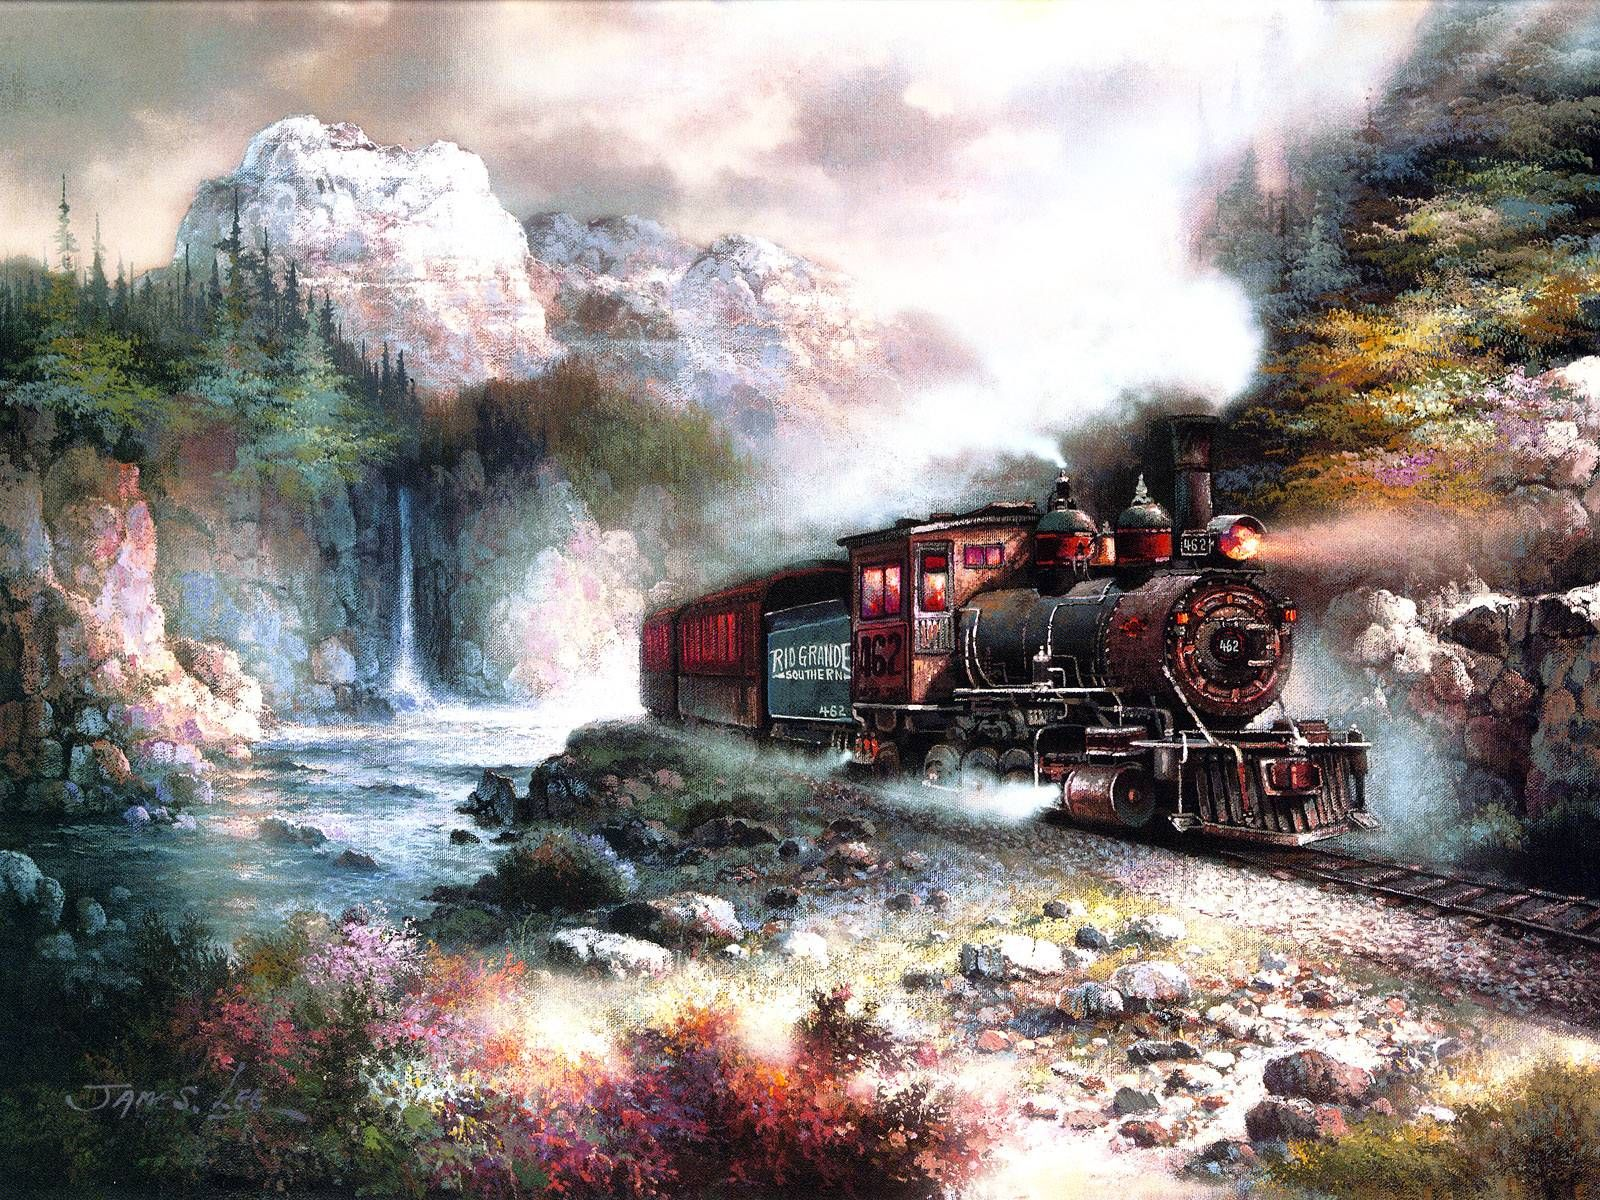 James Lee Rio Grande Express